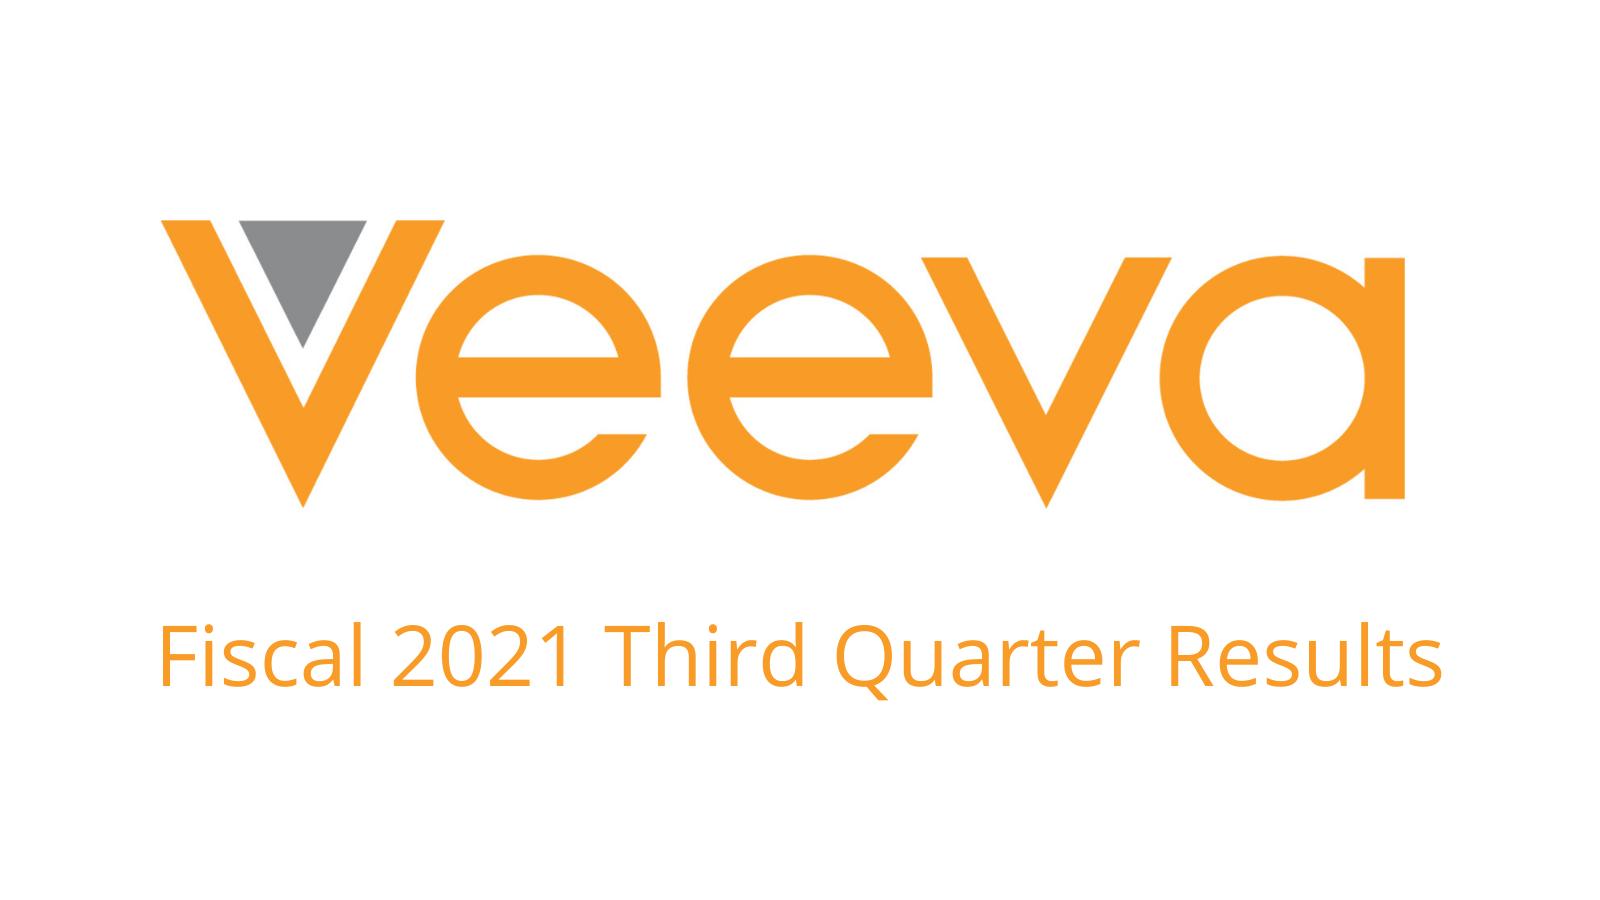 Veeva Announces Fiscal 2021 Third Quarter Results